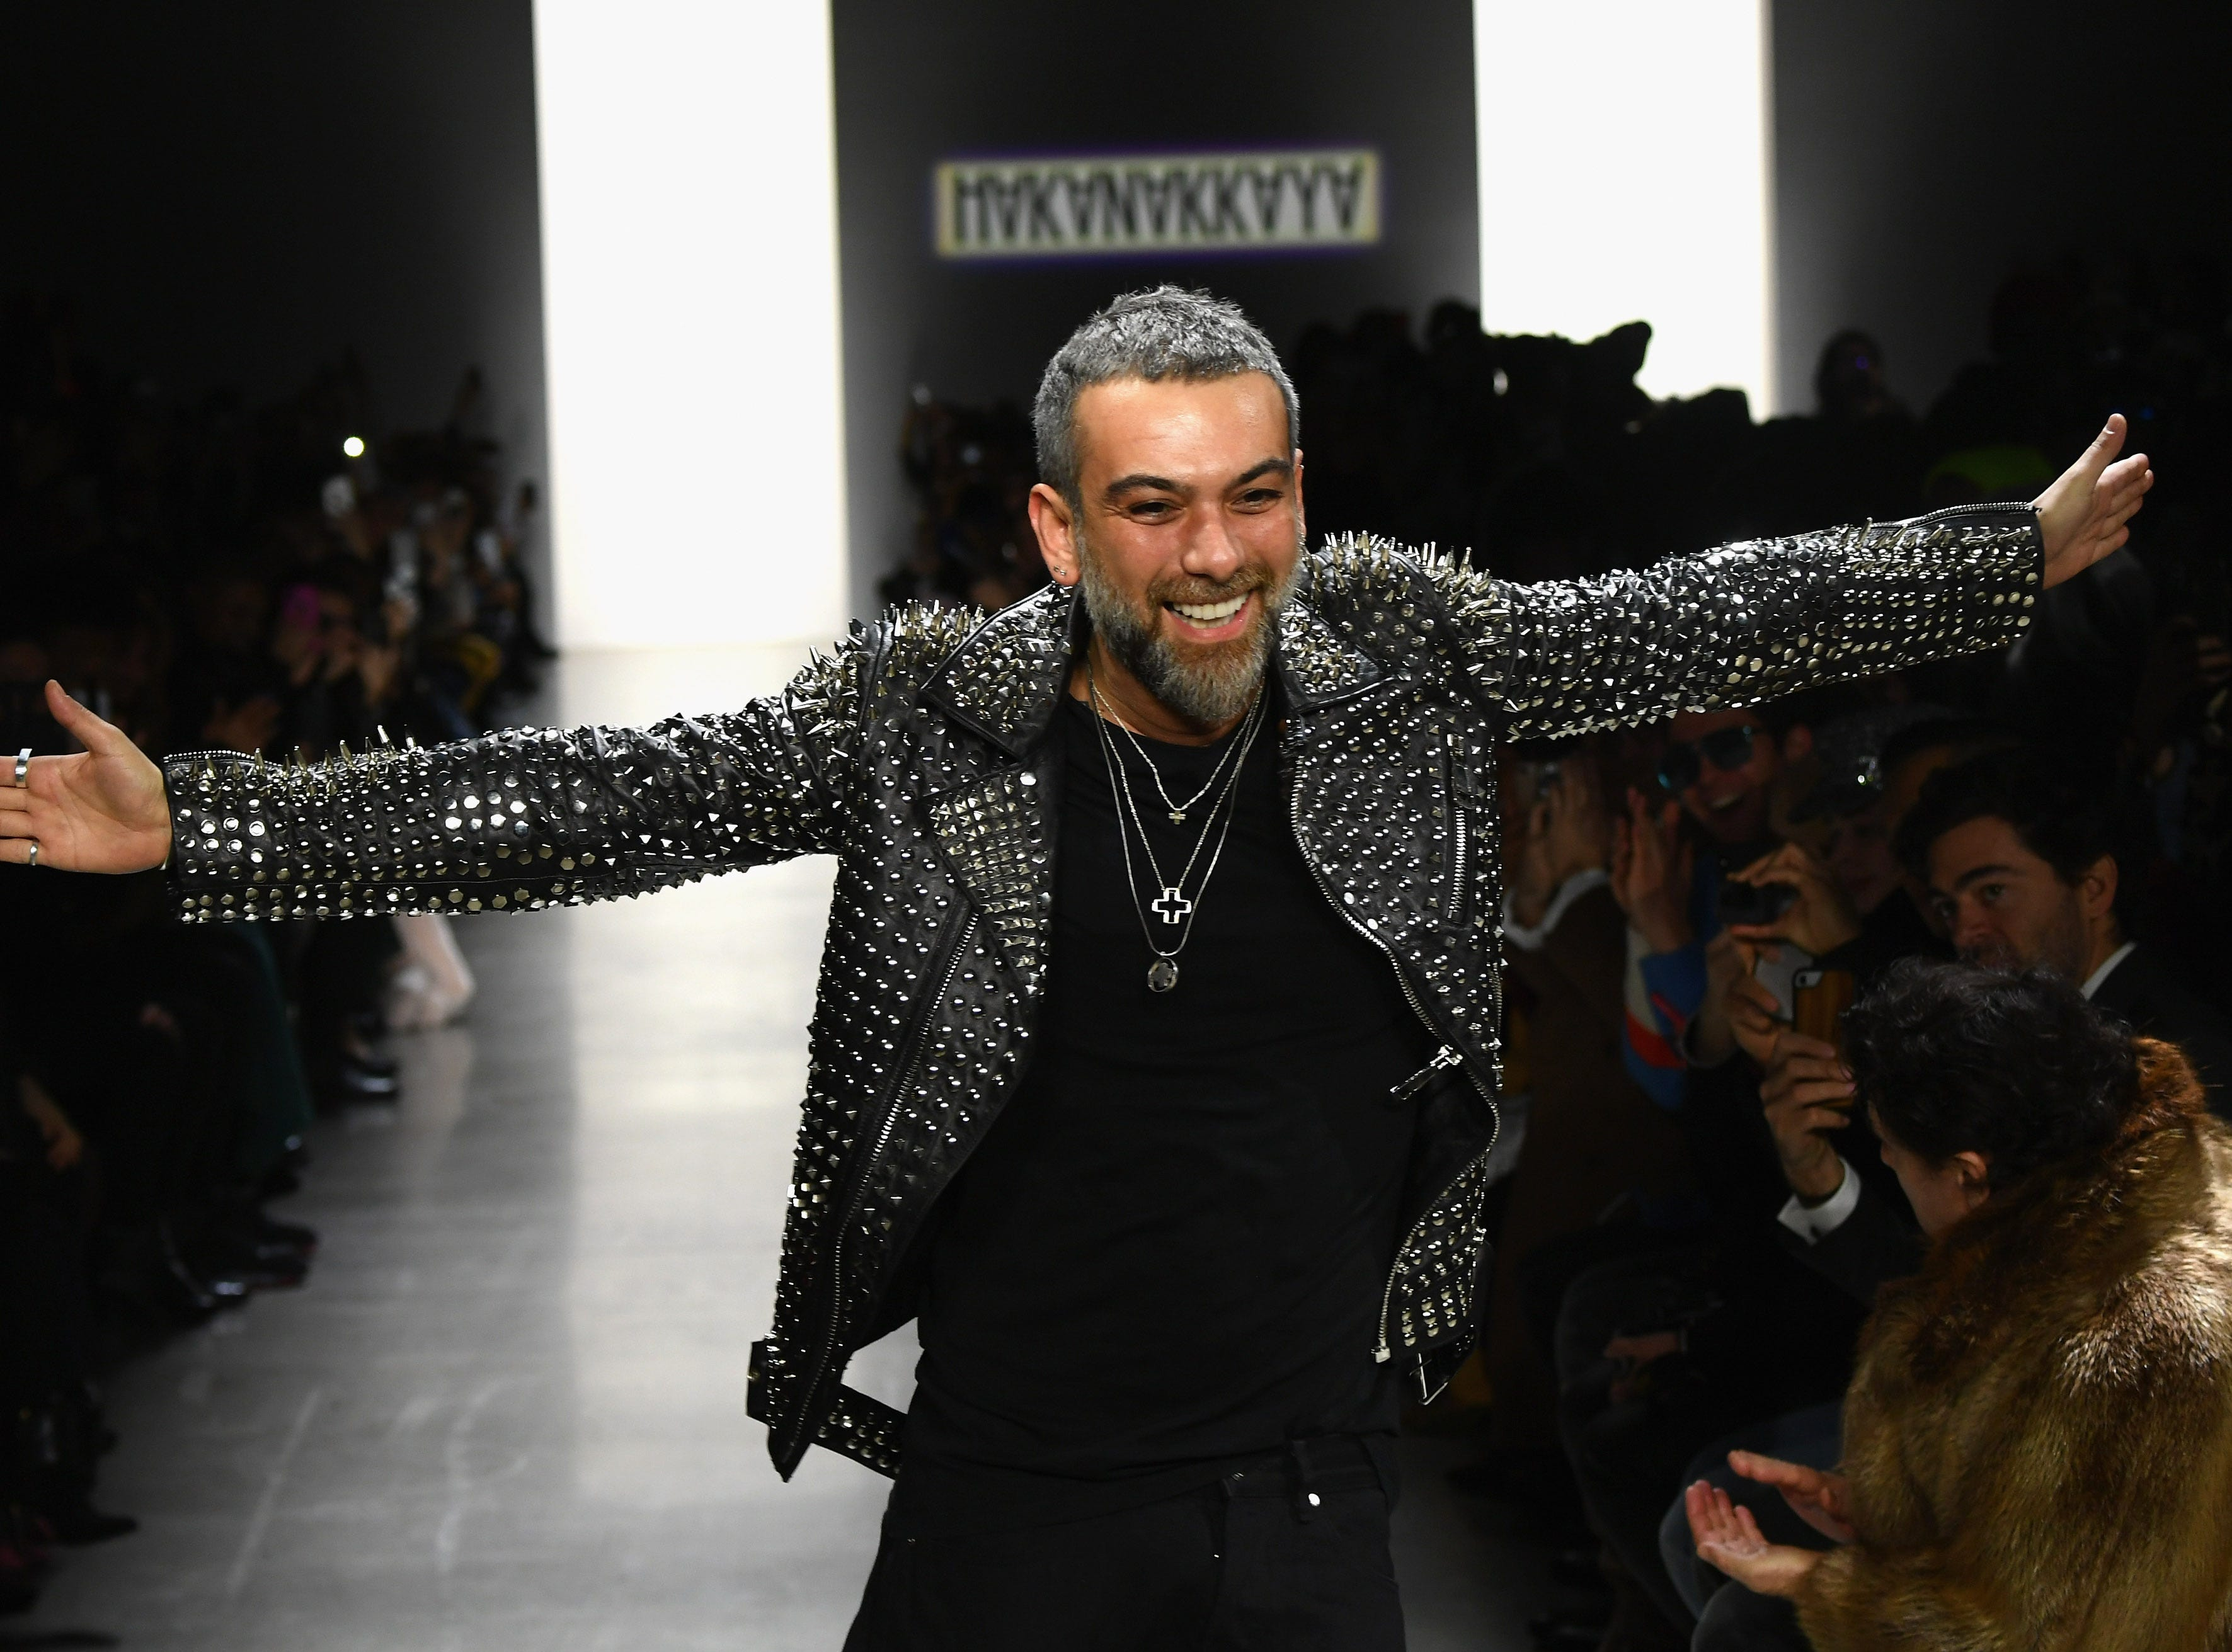 Designer Hakan Akkaya excitedly walks down the runway at his own show.